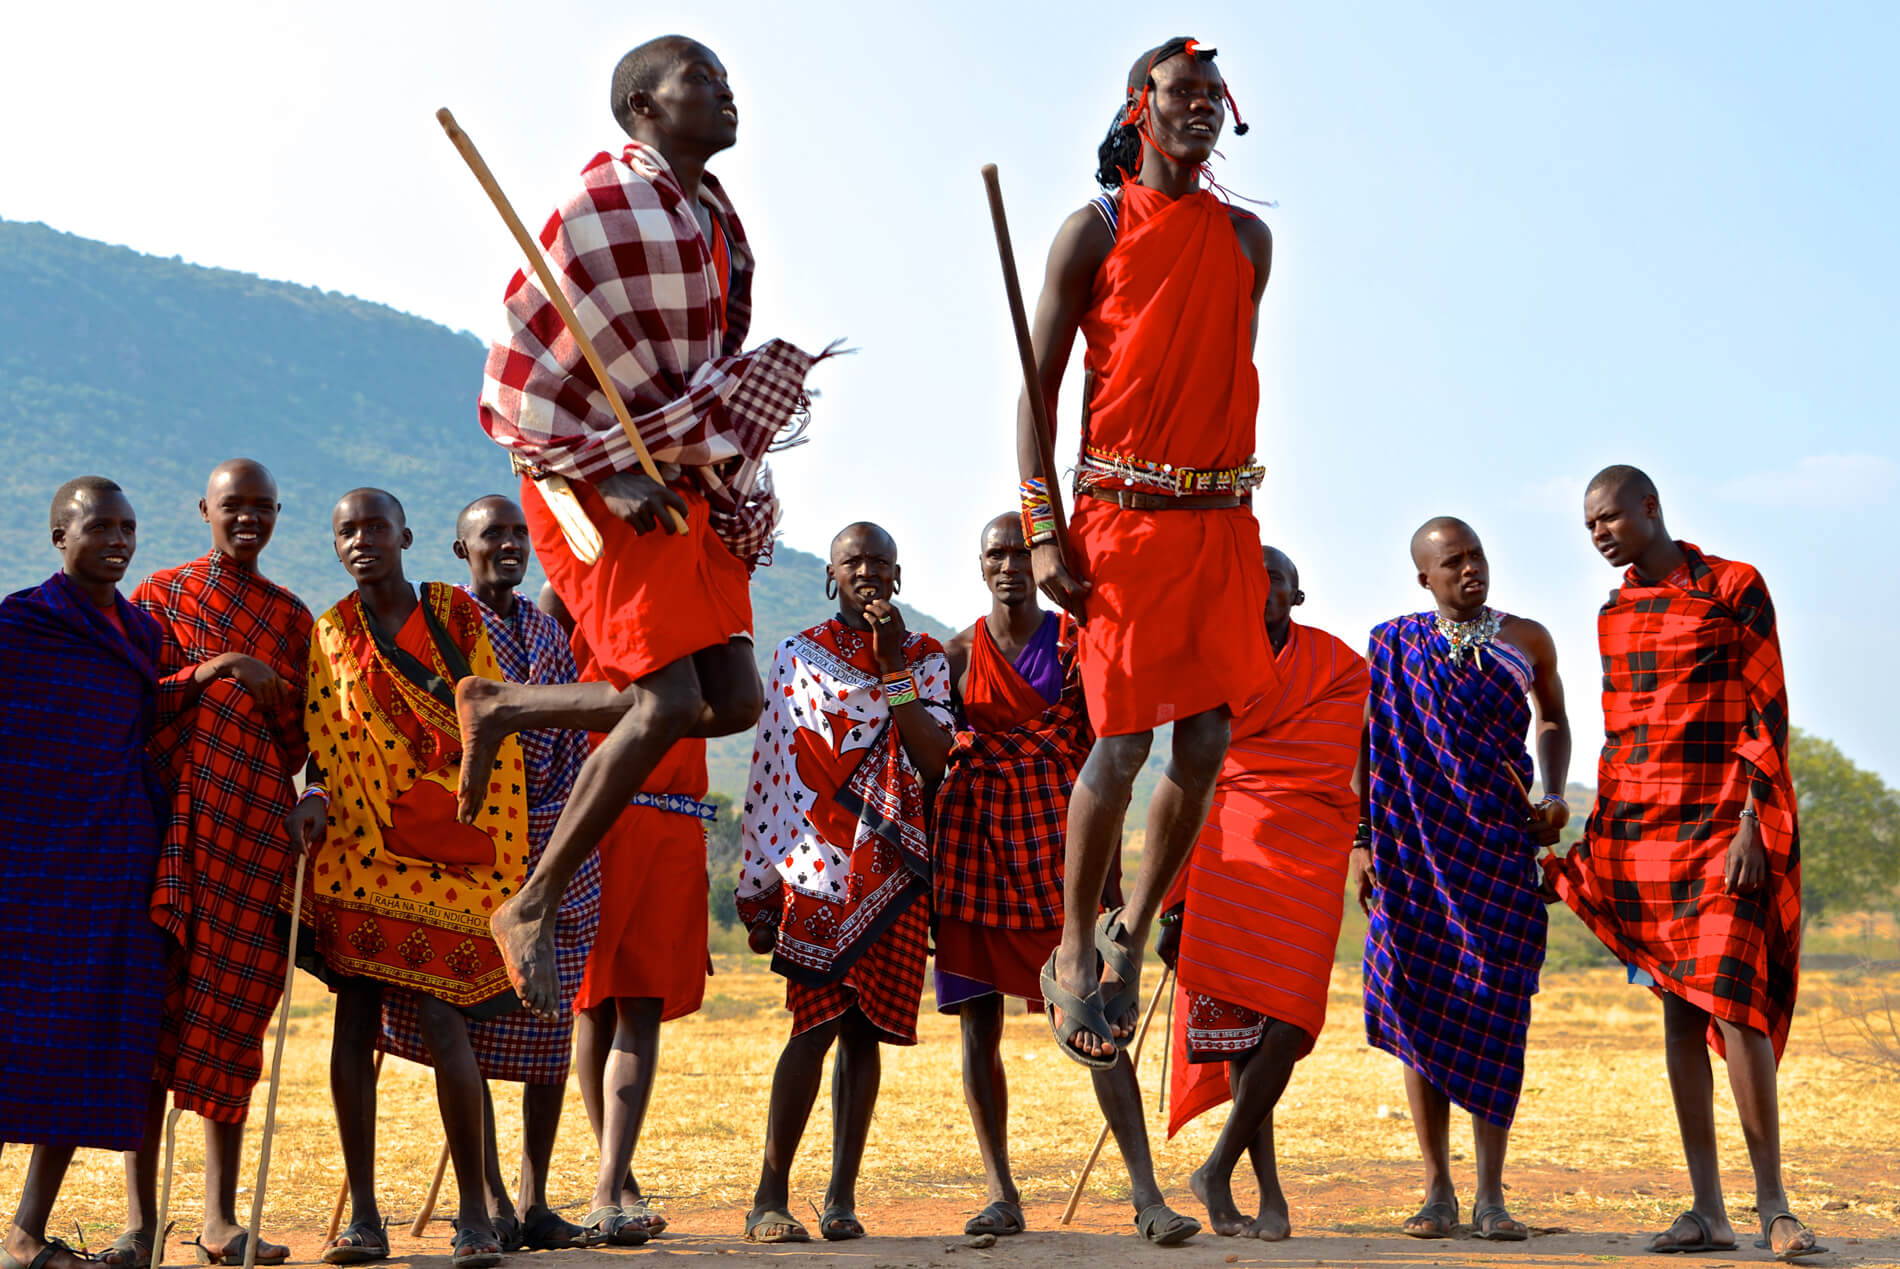 Танец Адуму племени Масаи